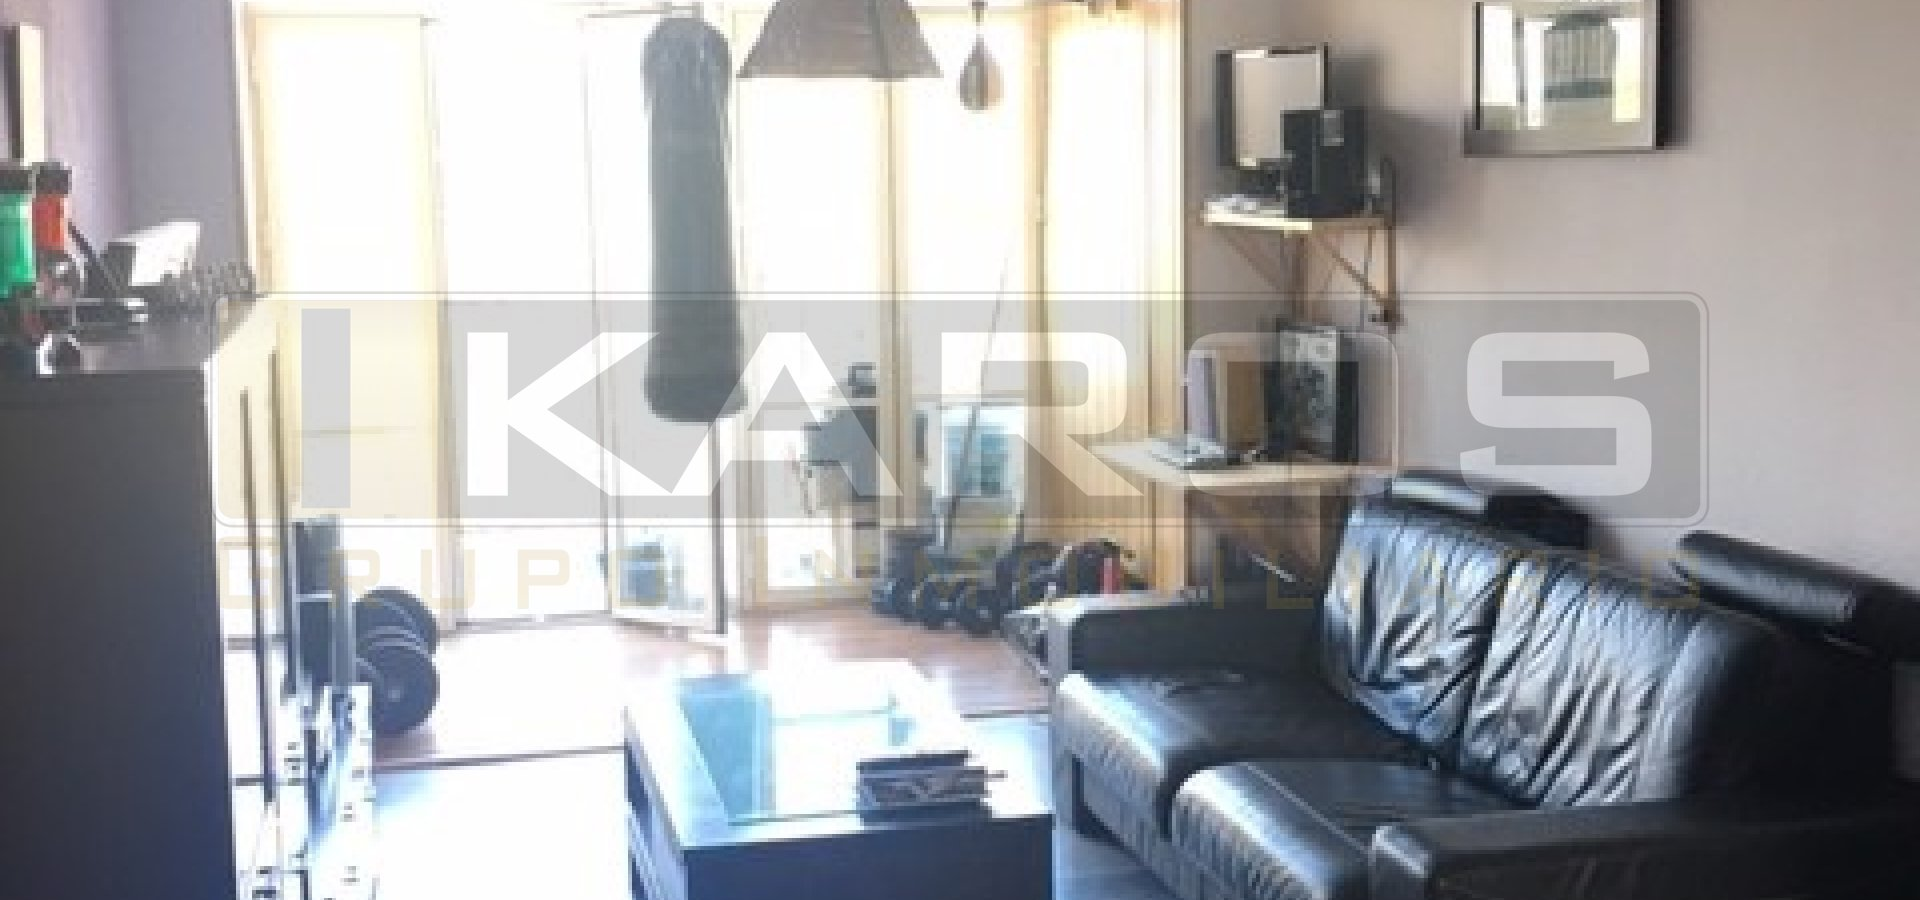 Venta mijas mijas costa apartamento apartamento for Costa muebles mijas